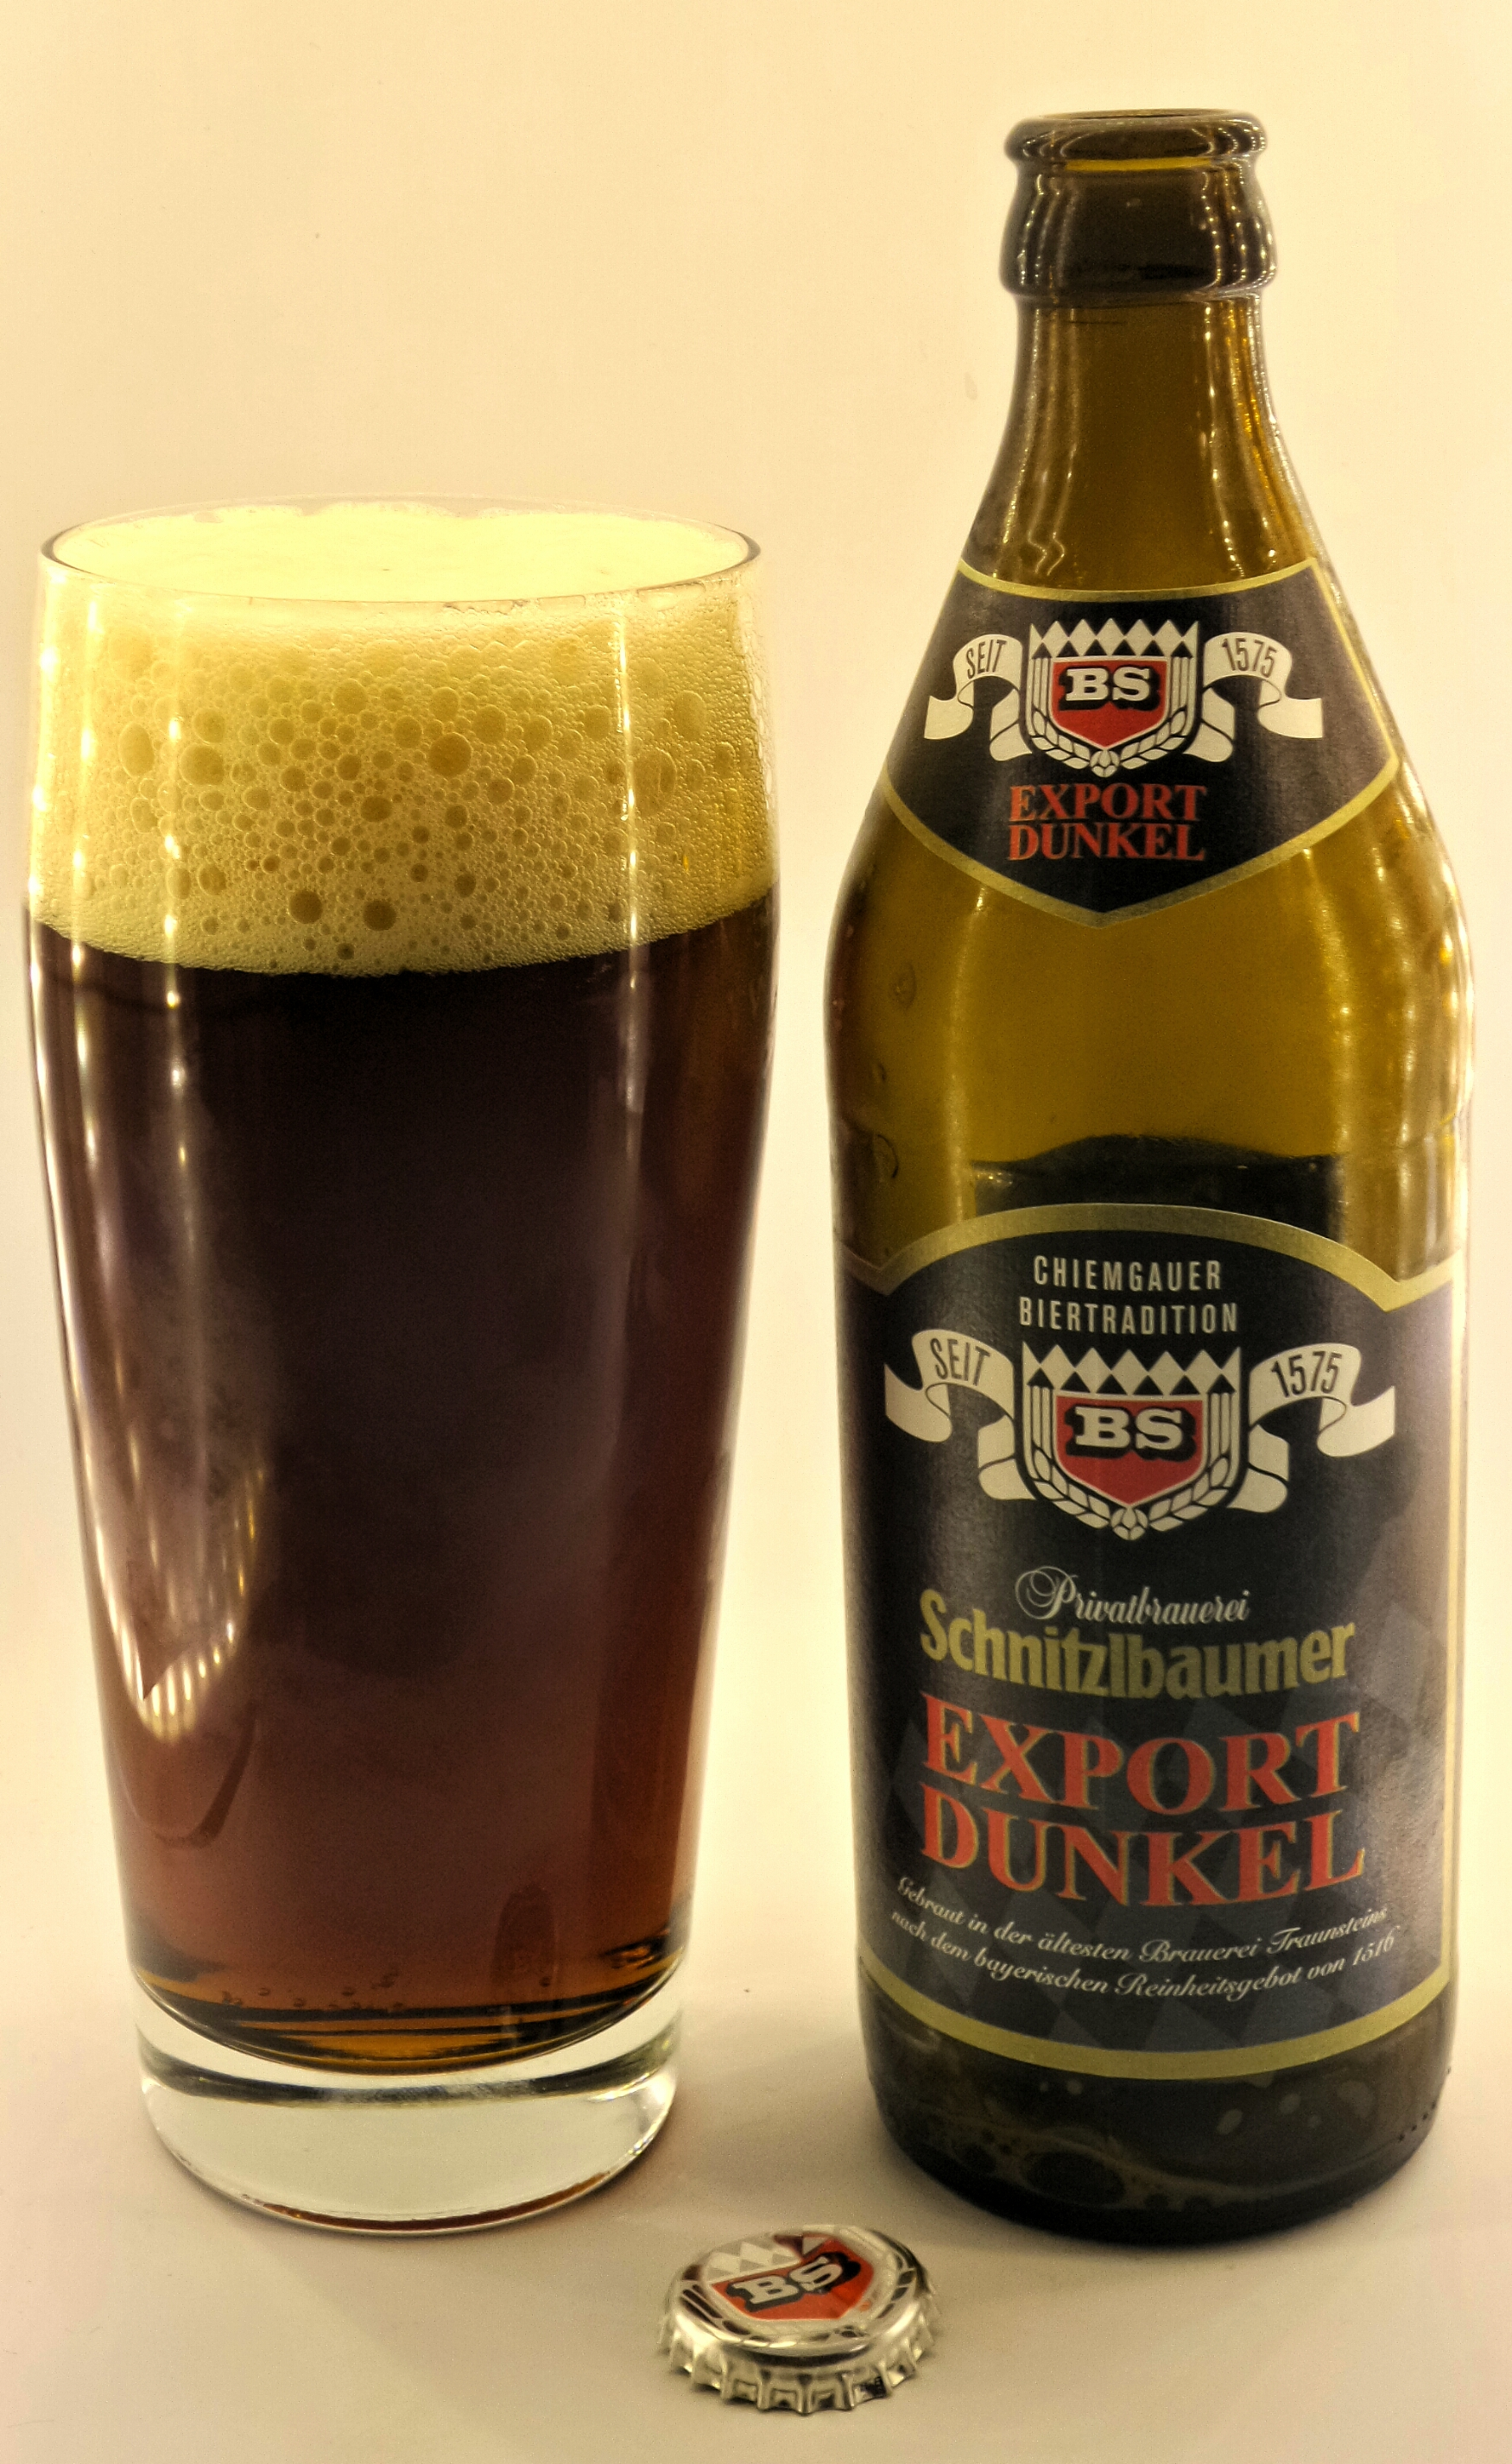 Schnitzlbaumer Export Dunkel